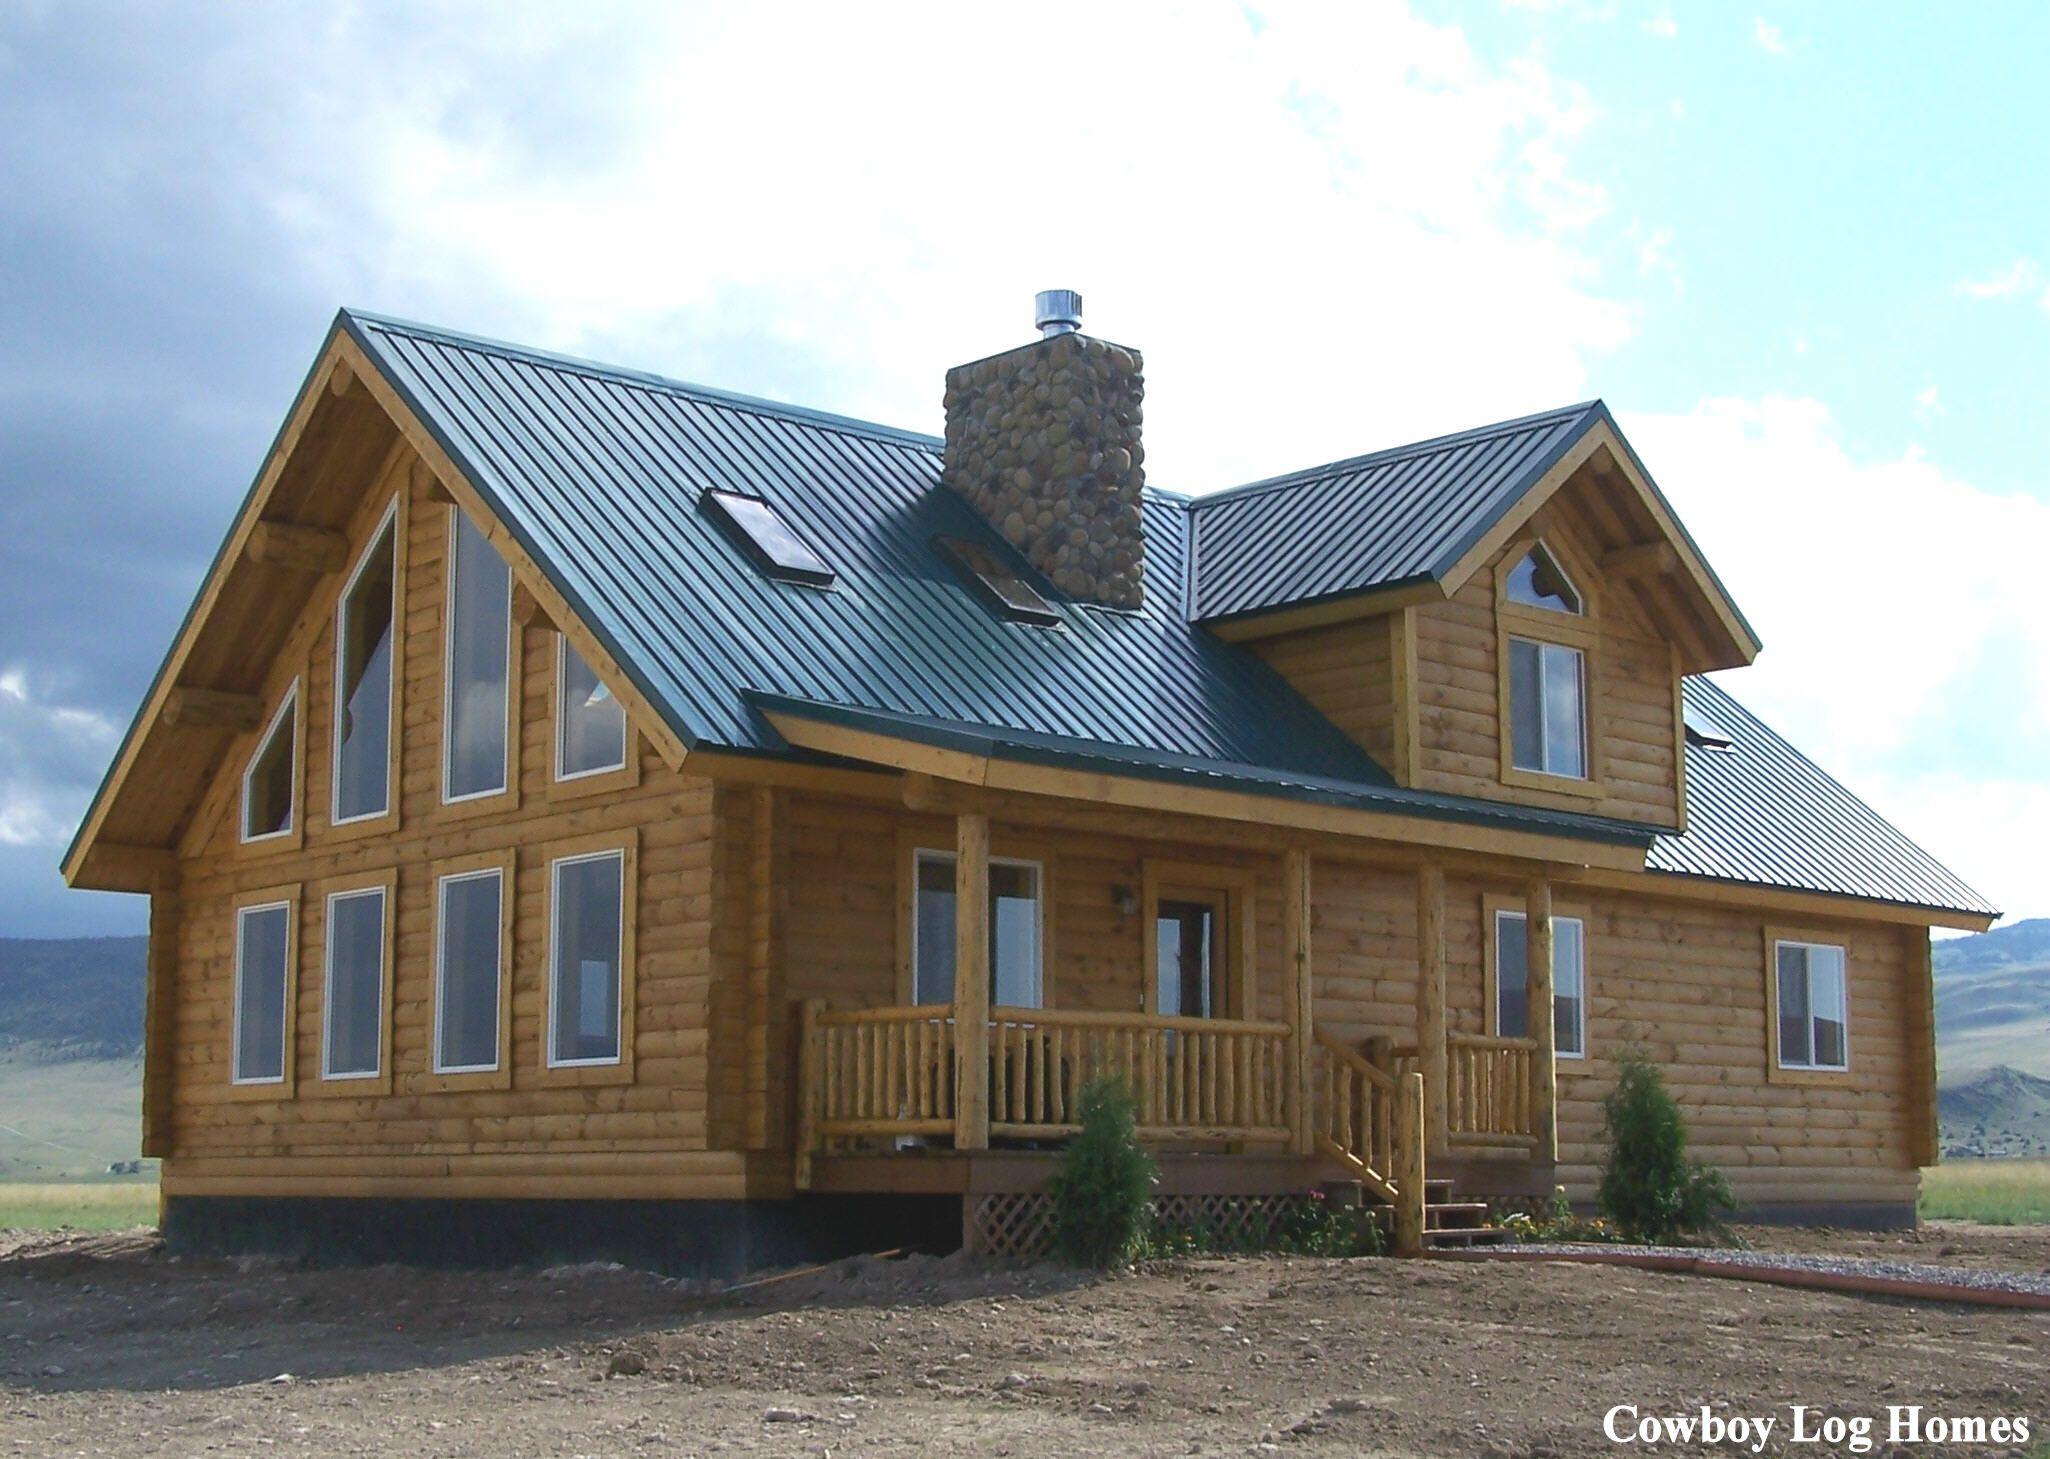 Cowboy Western House Plans Cowboy Log Homes Building